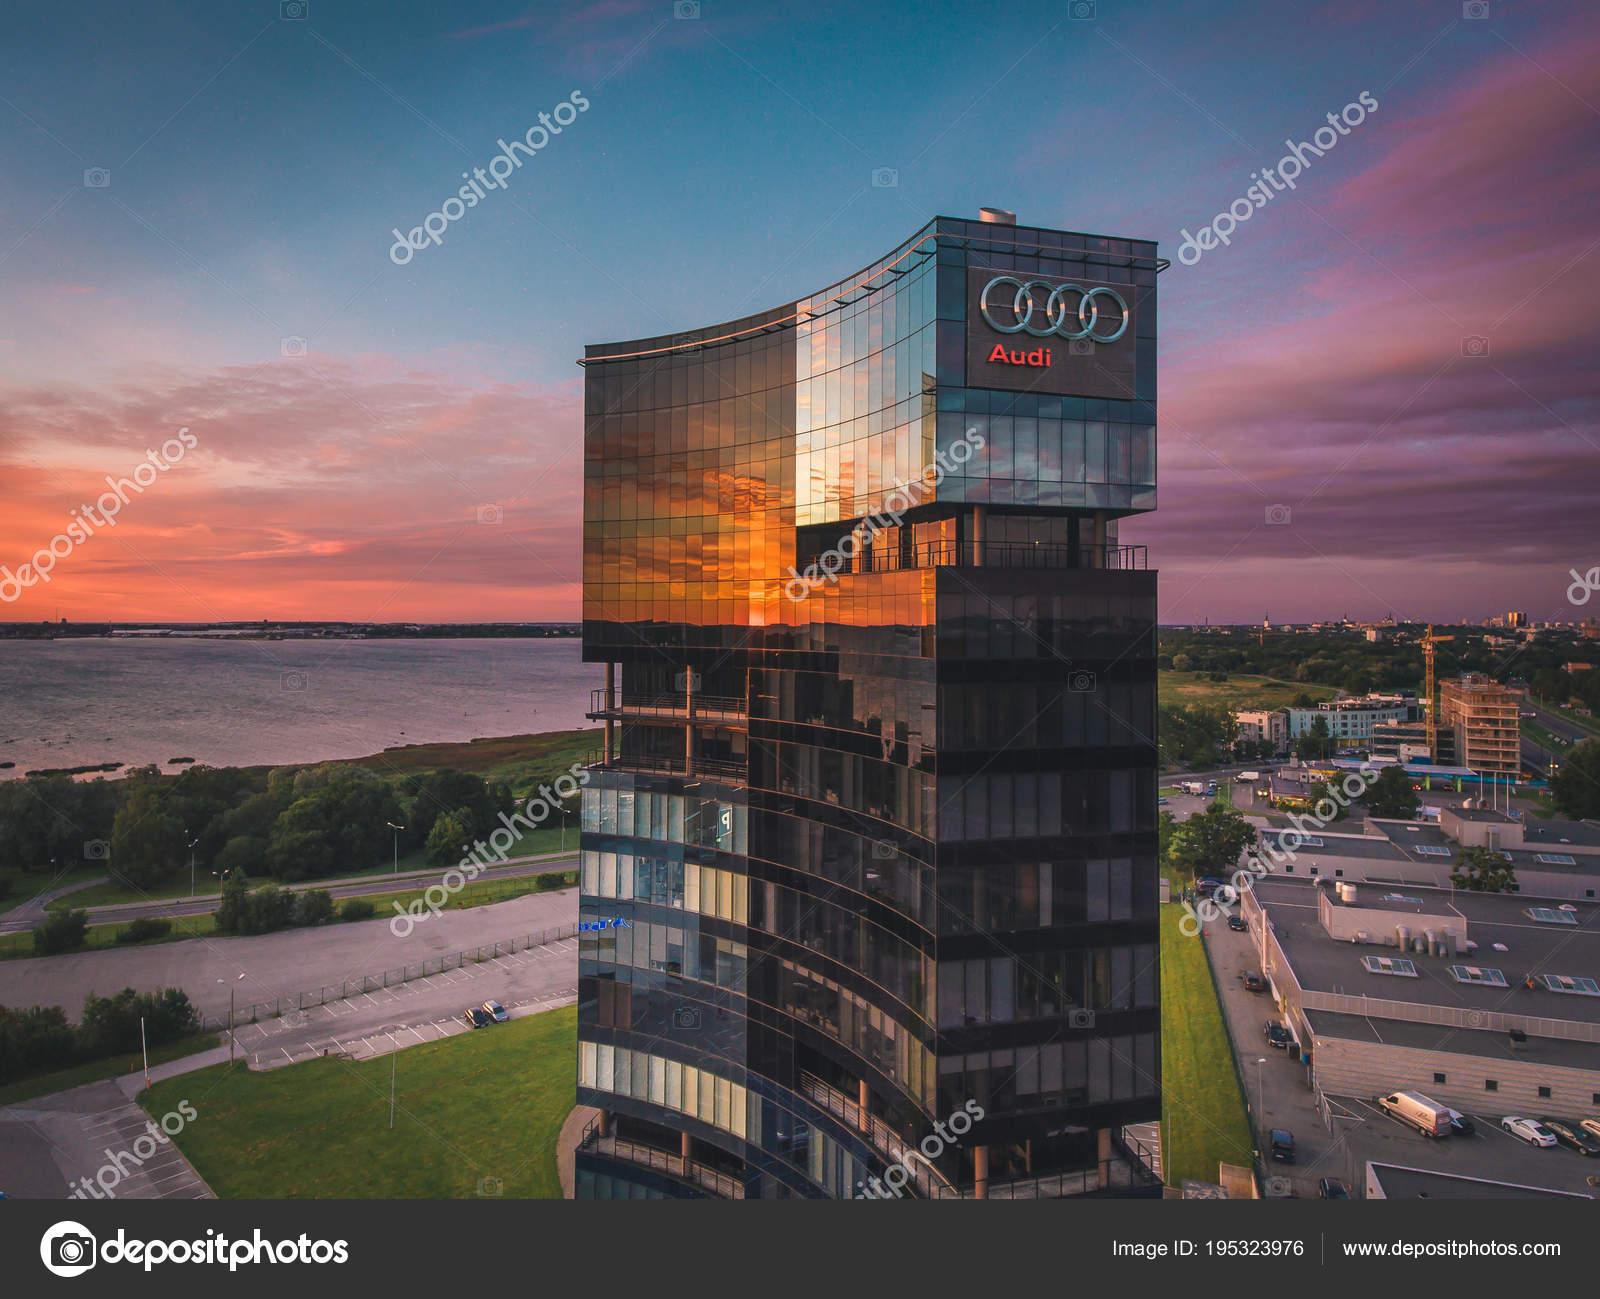 Tallinn estonie juillet vue aérienne logo audi sur façade